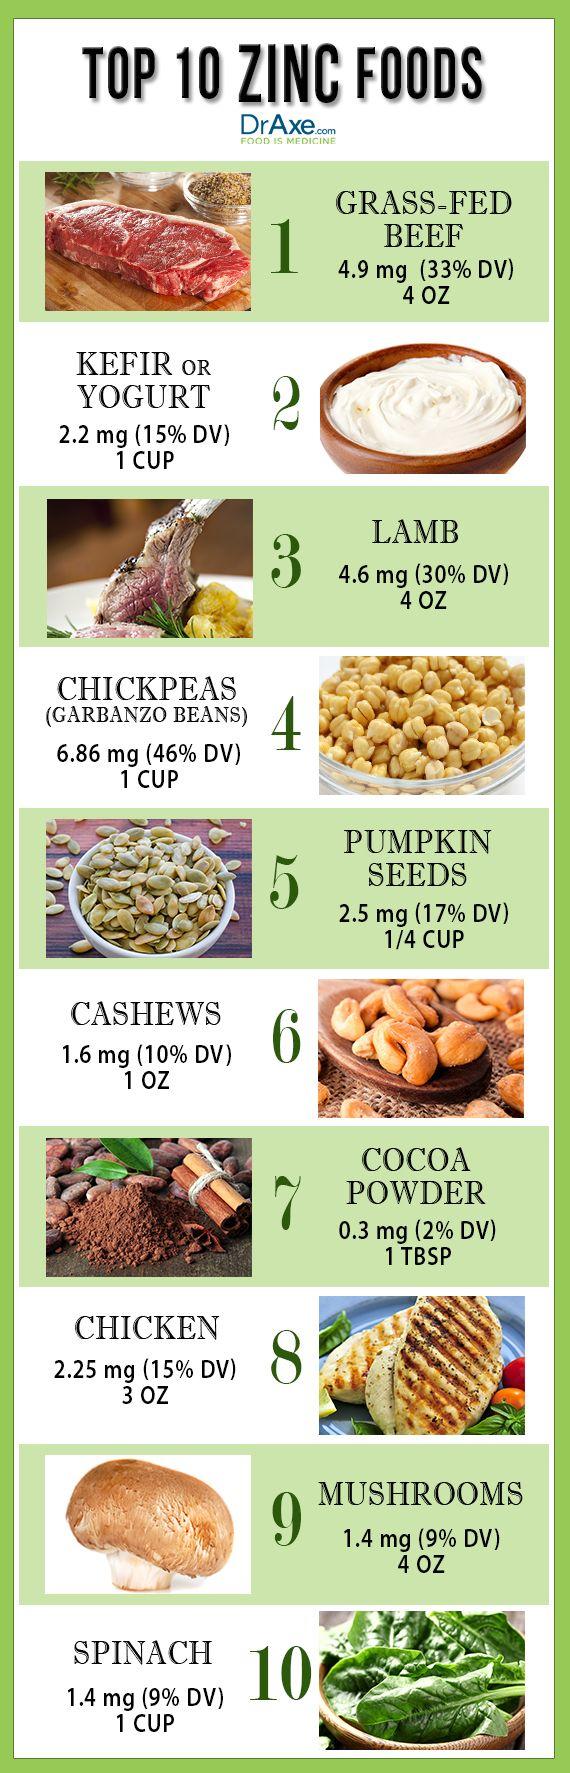 Top 10 High Zinc Foods - DrAxe.com